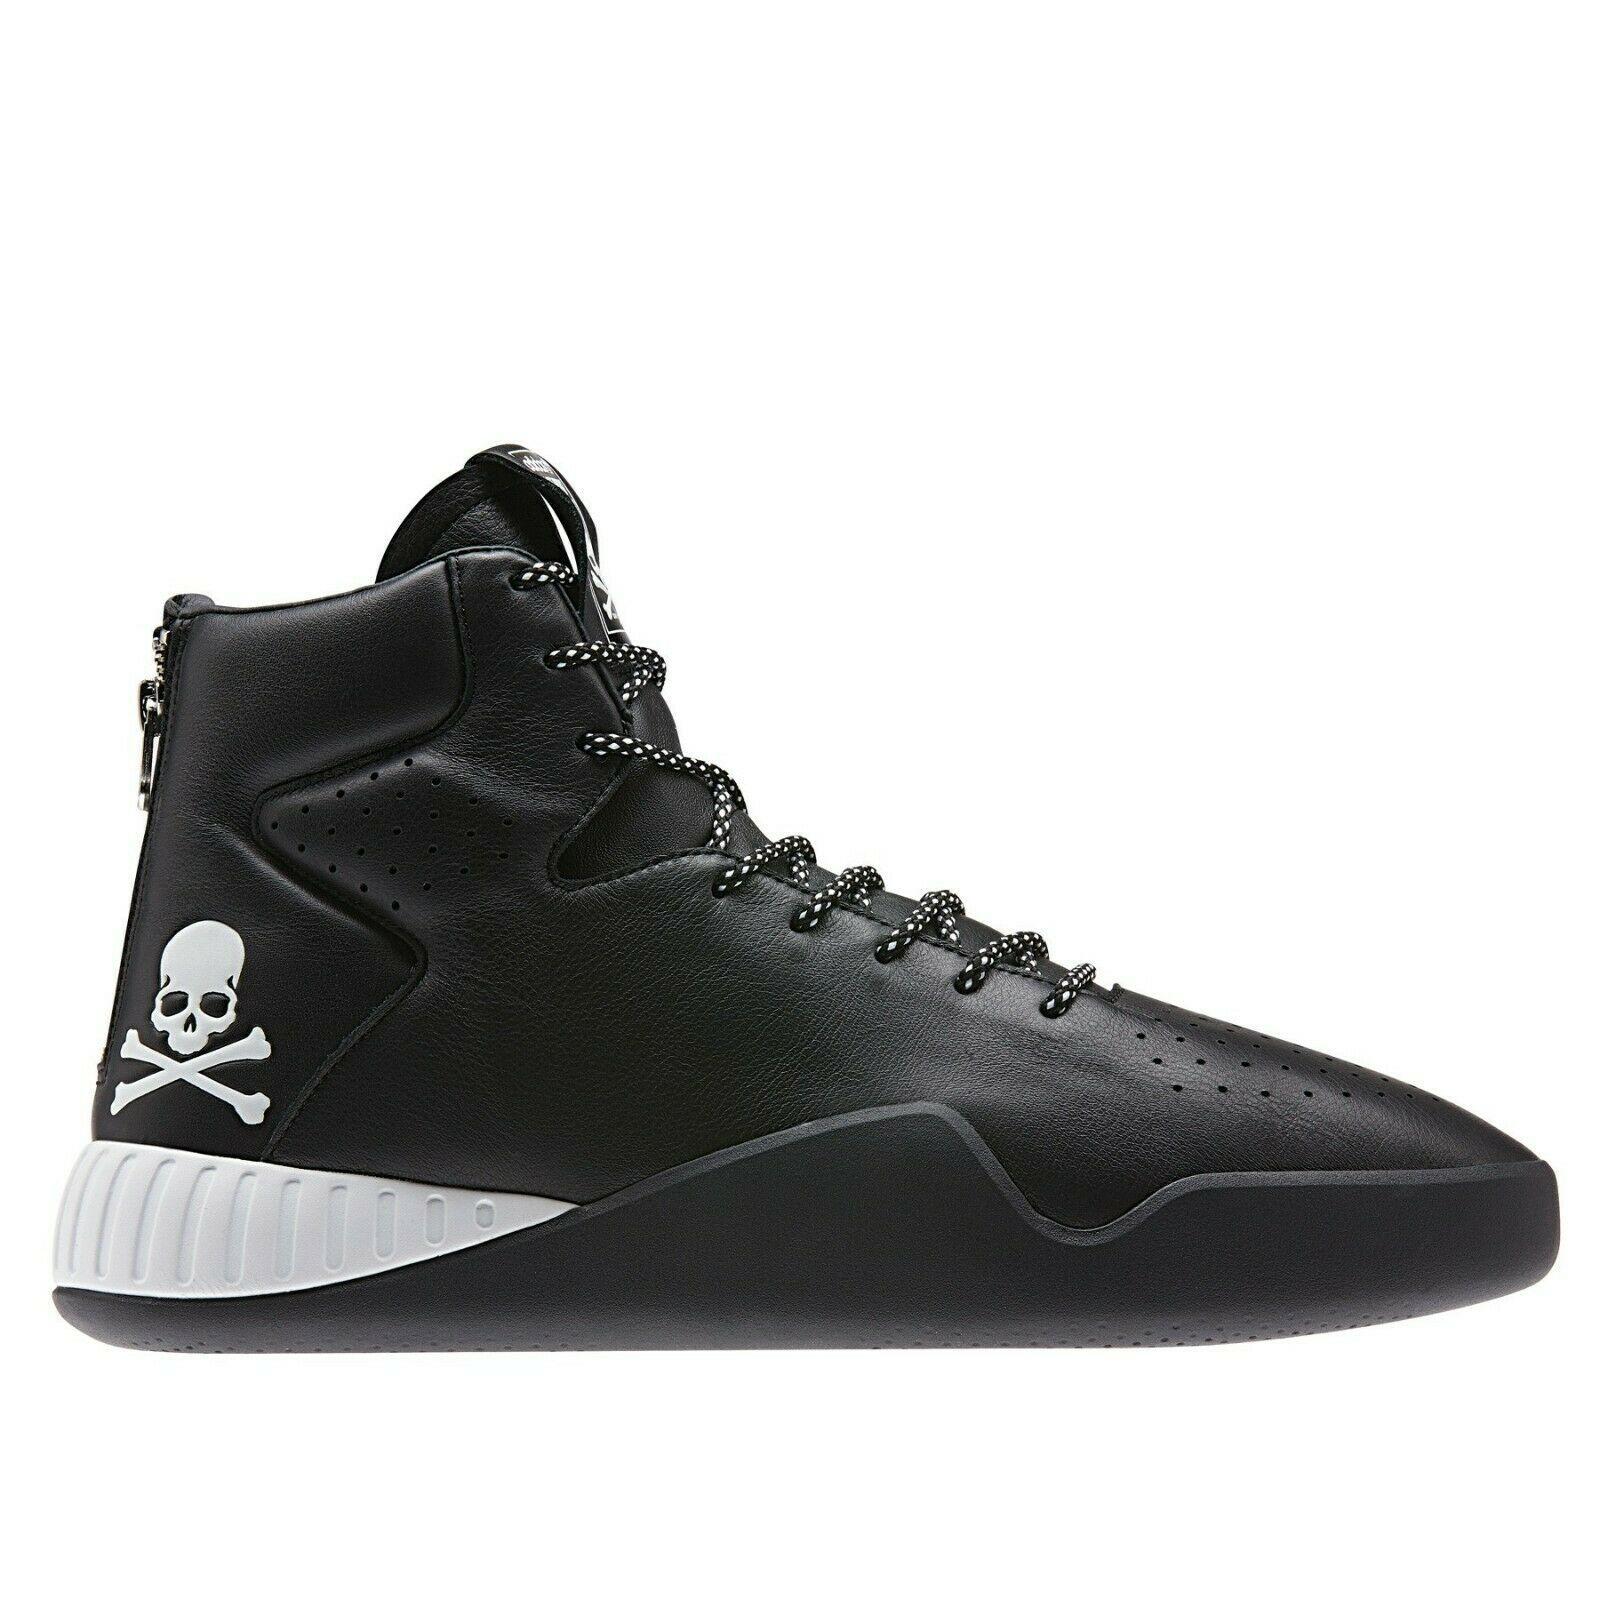 Adidas Mastermind Japan X Tubular Instinct BA9727 Black Mens Size 10.5